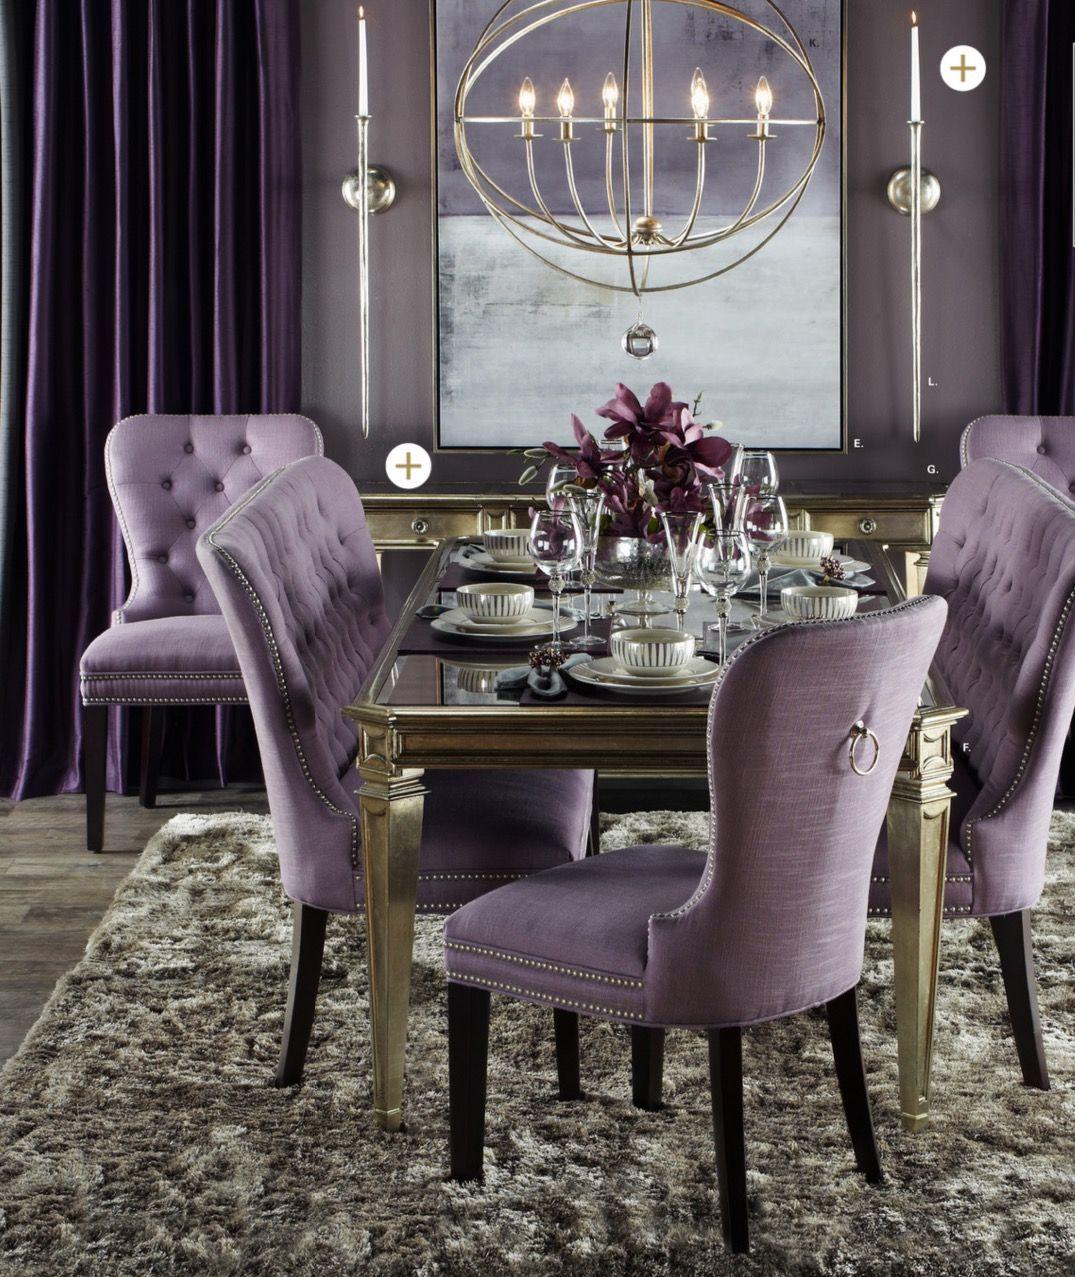 Dining Room Featuring Purple Dining Diningroom Diningroomideas Decor Purple Chandelier Lighting Interiordesign I Ev Için Oturma Odası Fikirleri Dekor